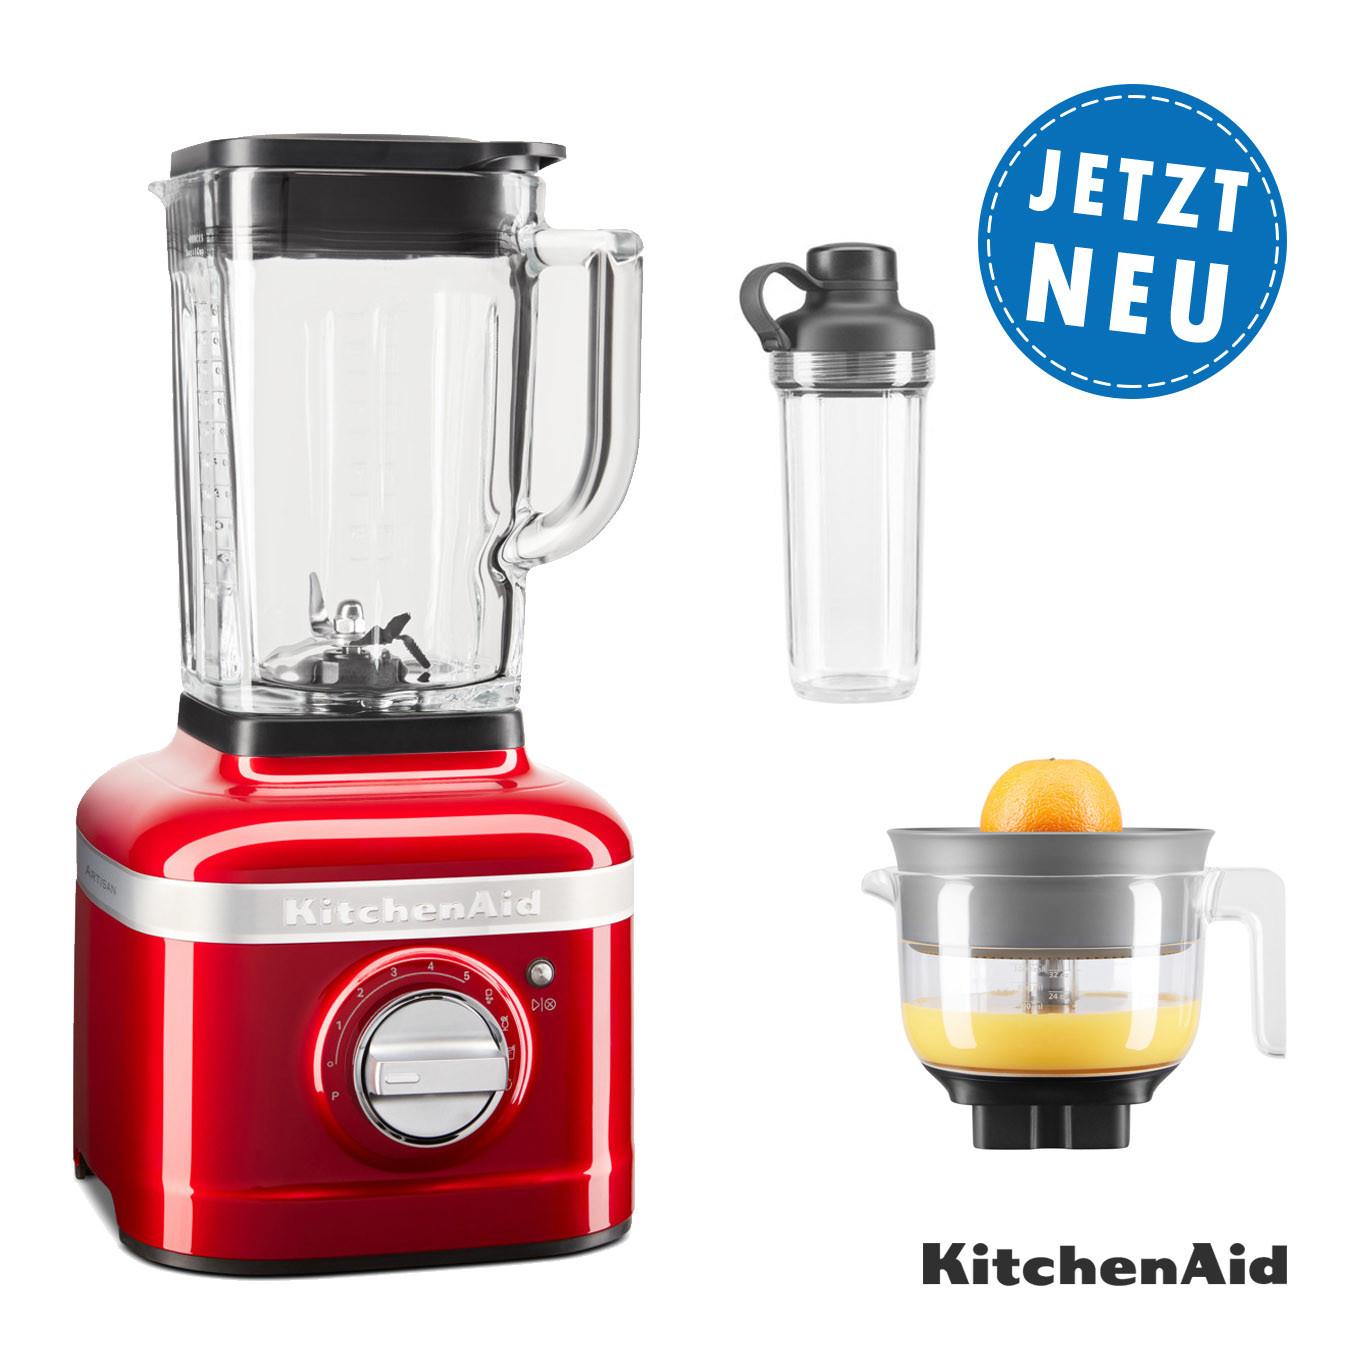 KitchenAid ARTISAN K400 Standmixer 5KSB4026EER + 1x To-Go Behälter